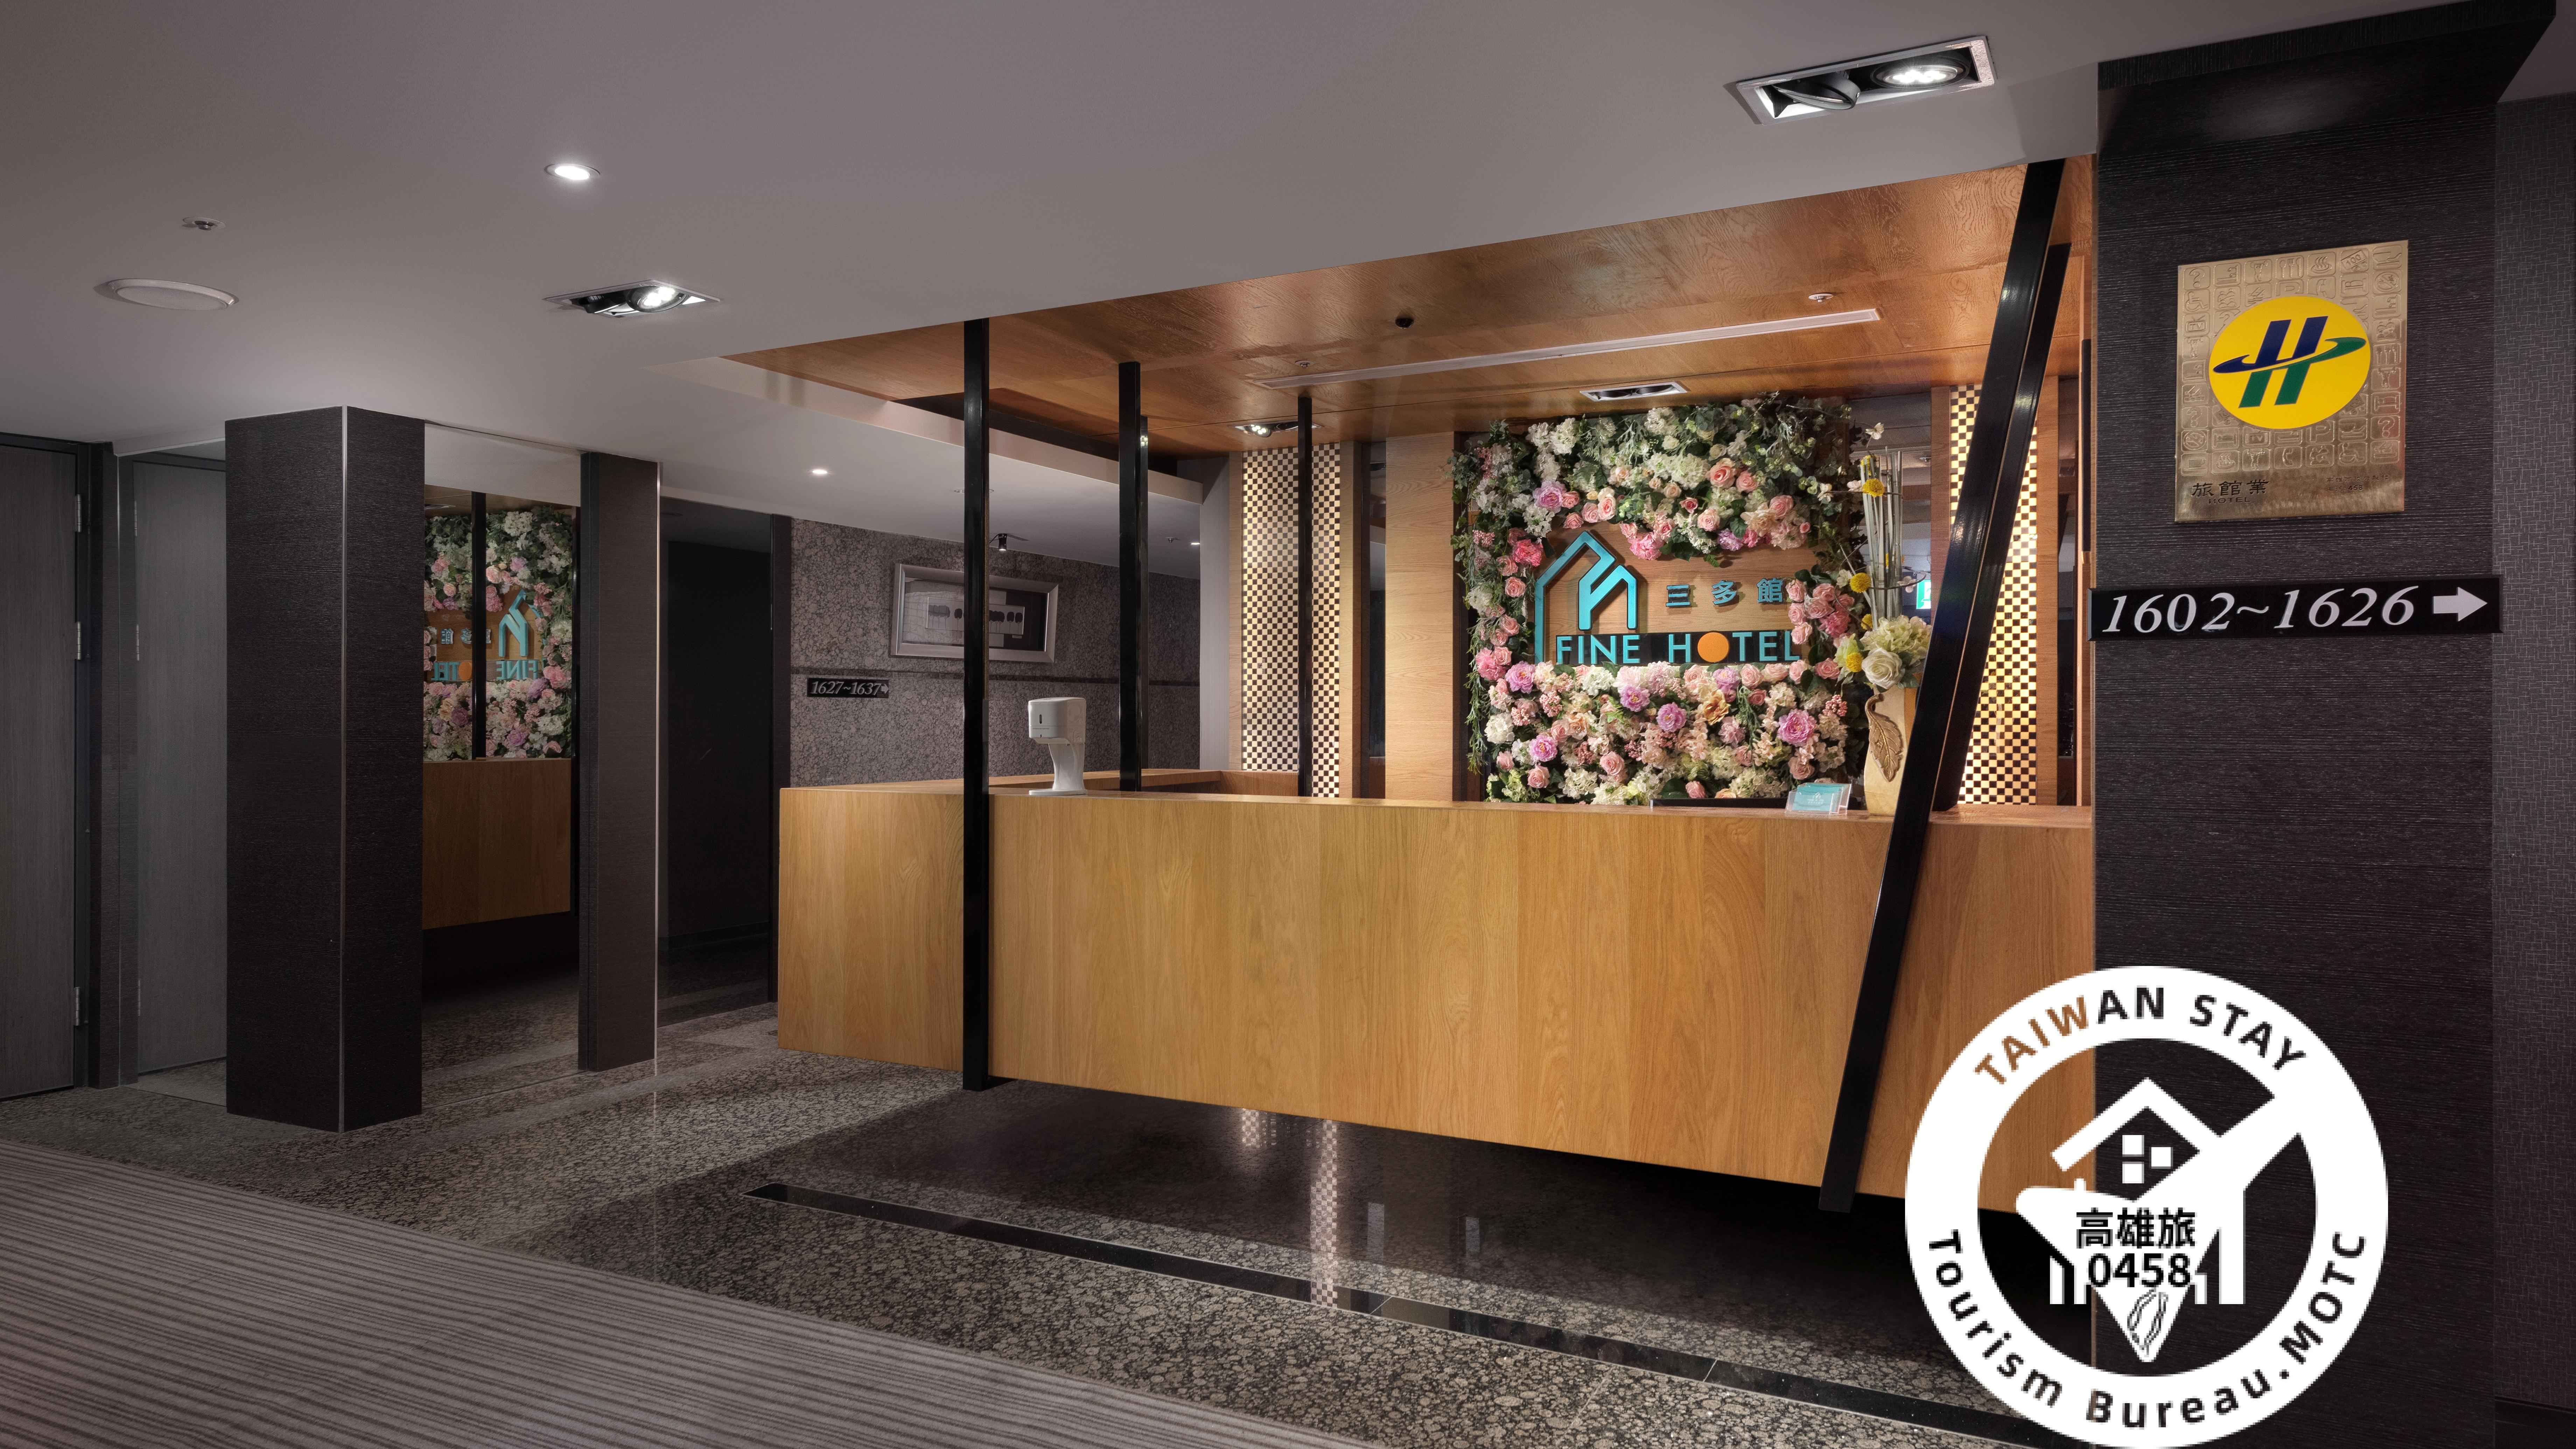 Fine Hotel Sanduo Branch